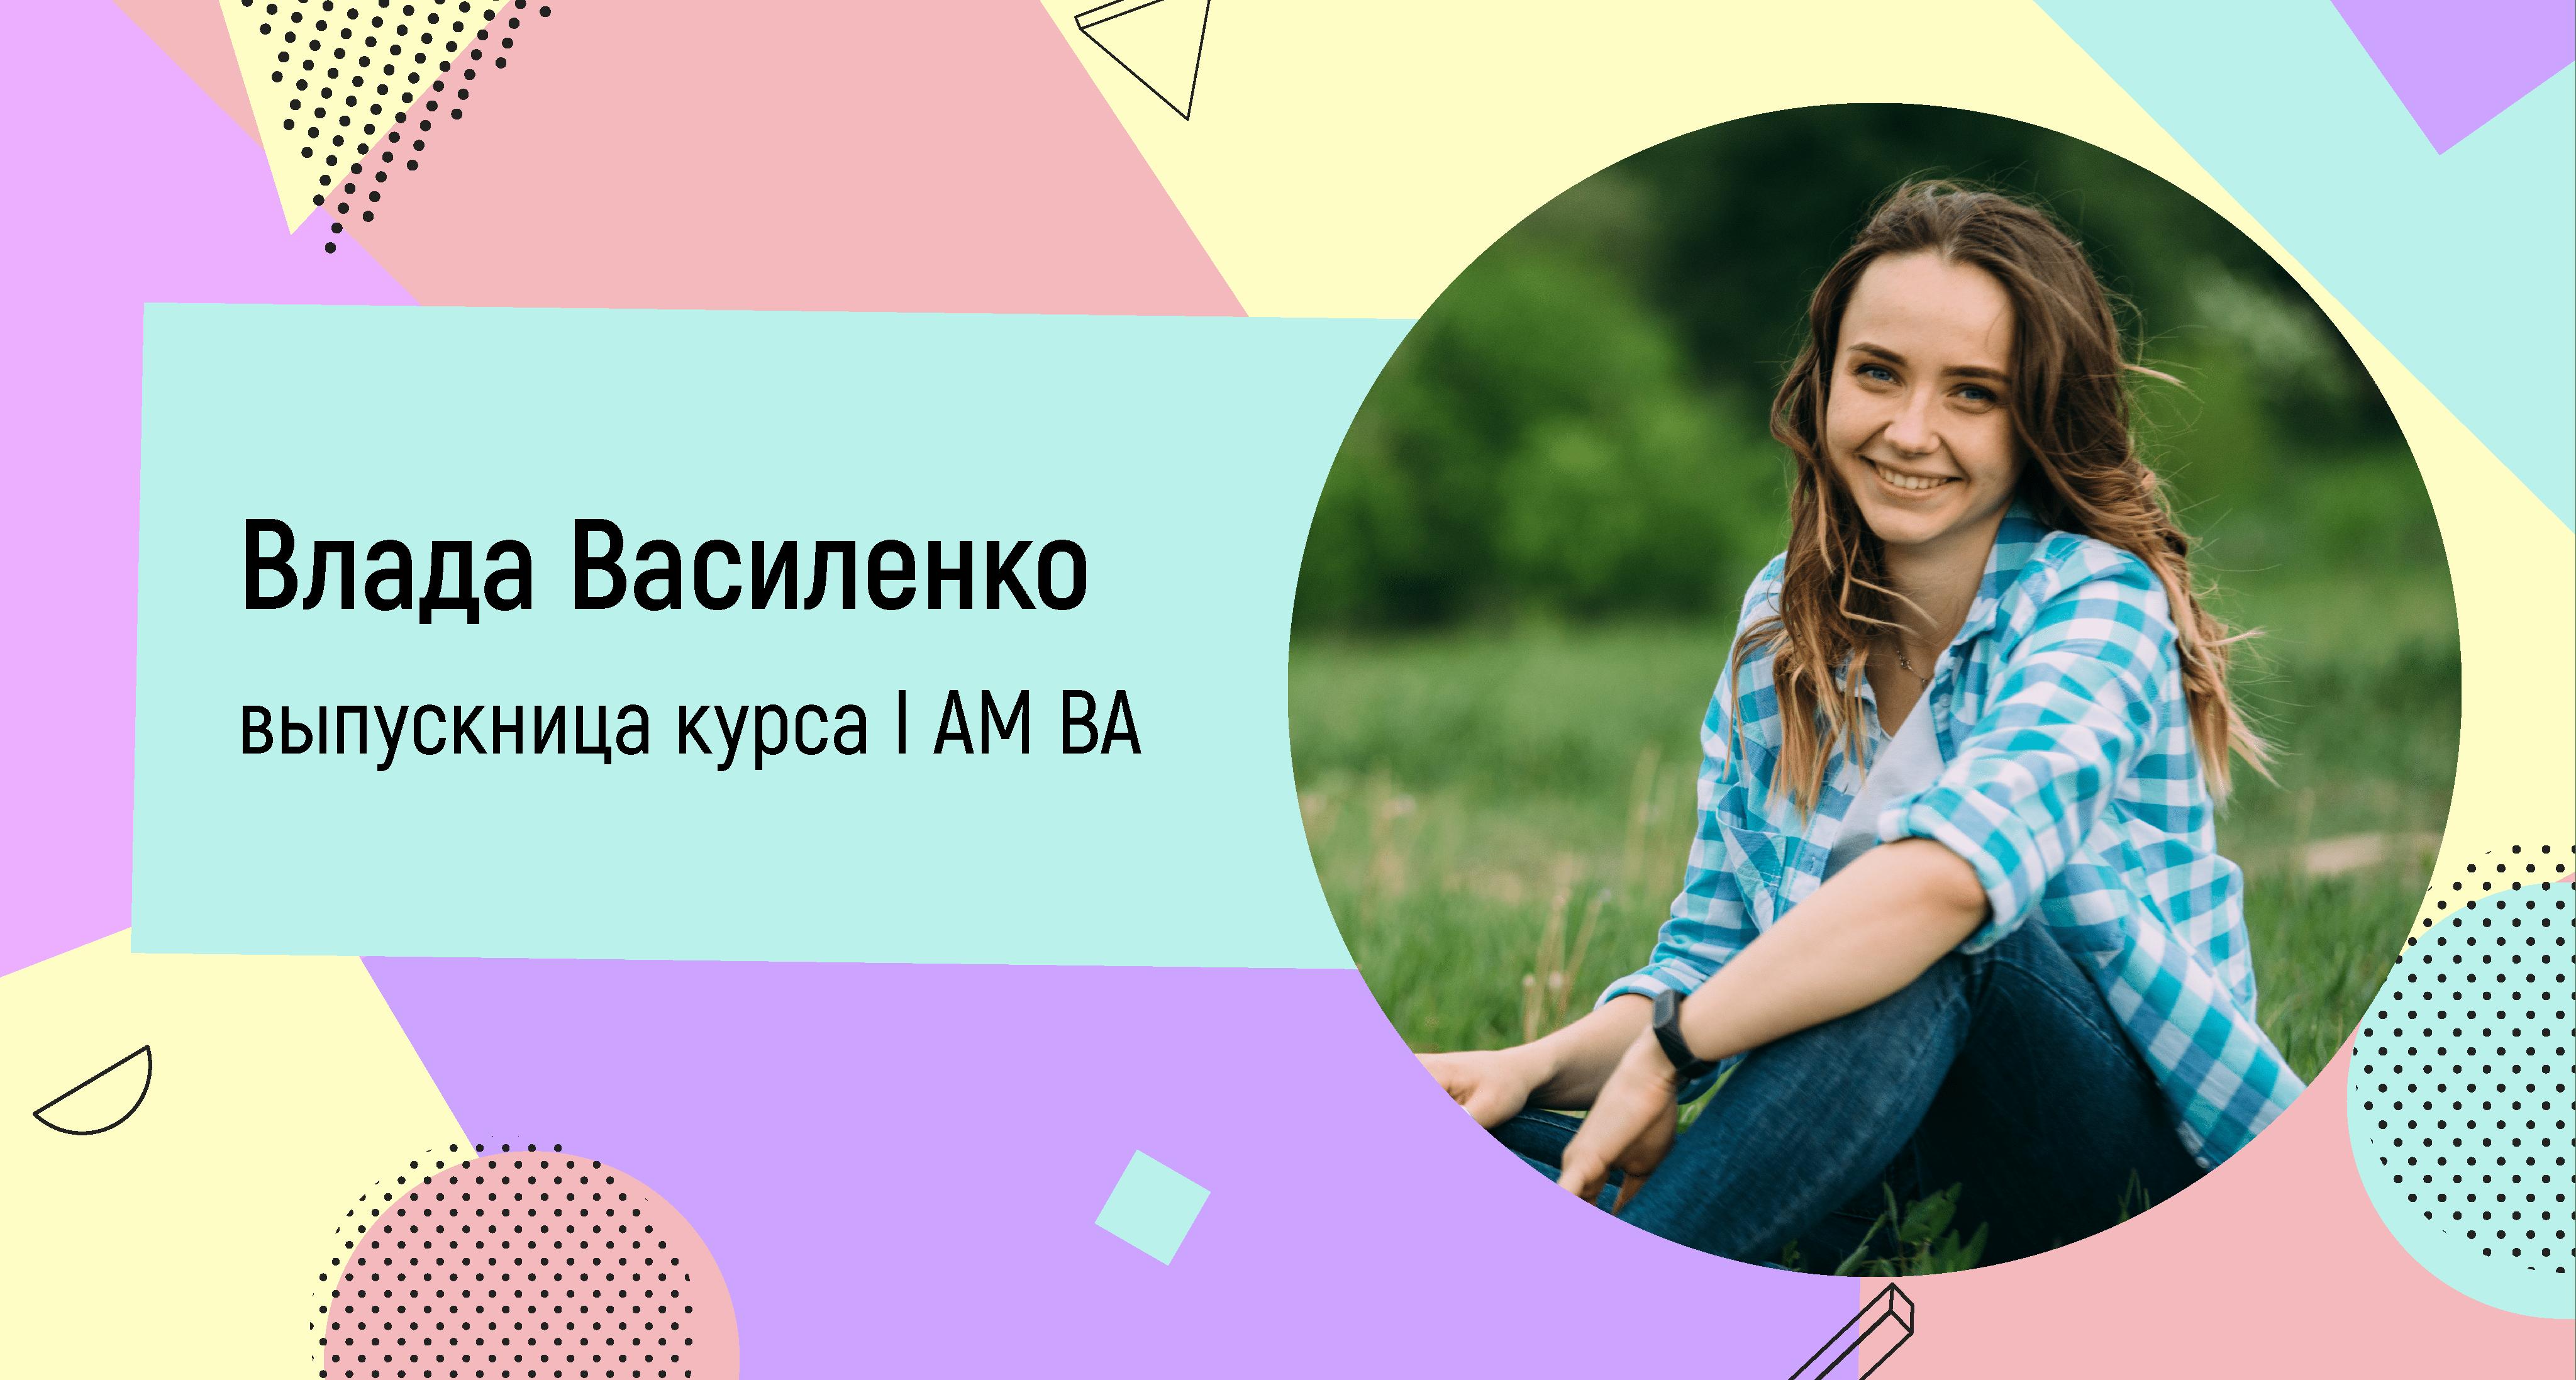 Как Влада Василенко стала бизнес-аналитиком в IT-компании 1